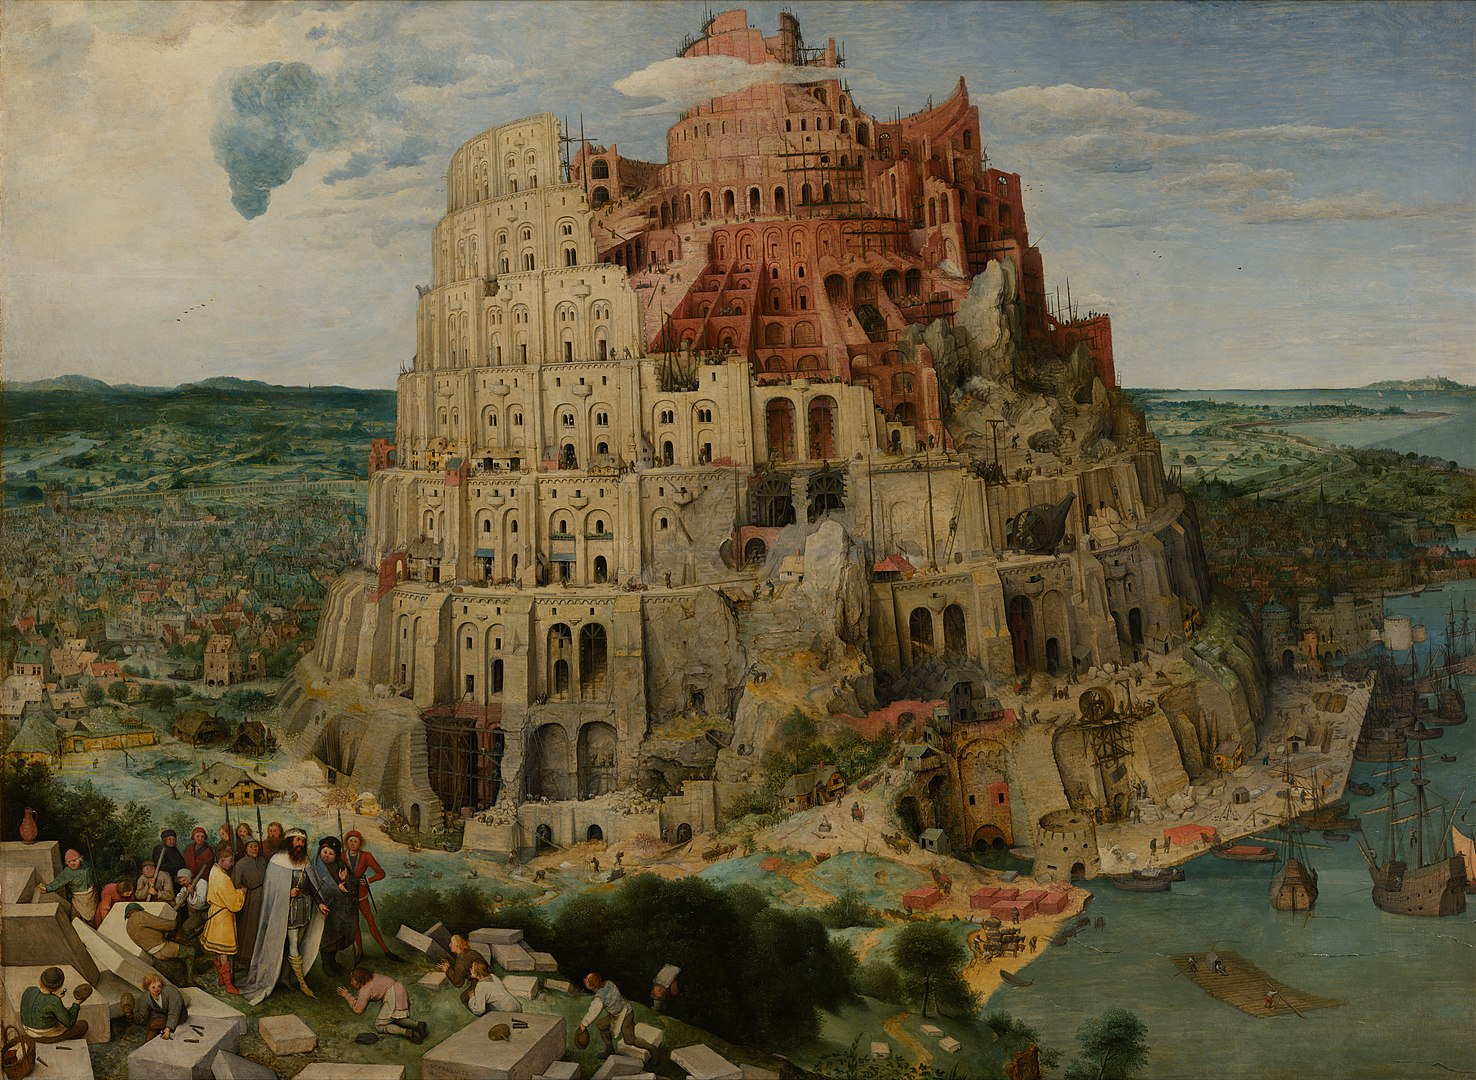 1476px-pieter_bruegel_the_elder_the_tower_of_babel_vienna_google_art_project.jpg